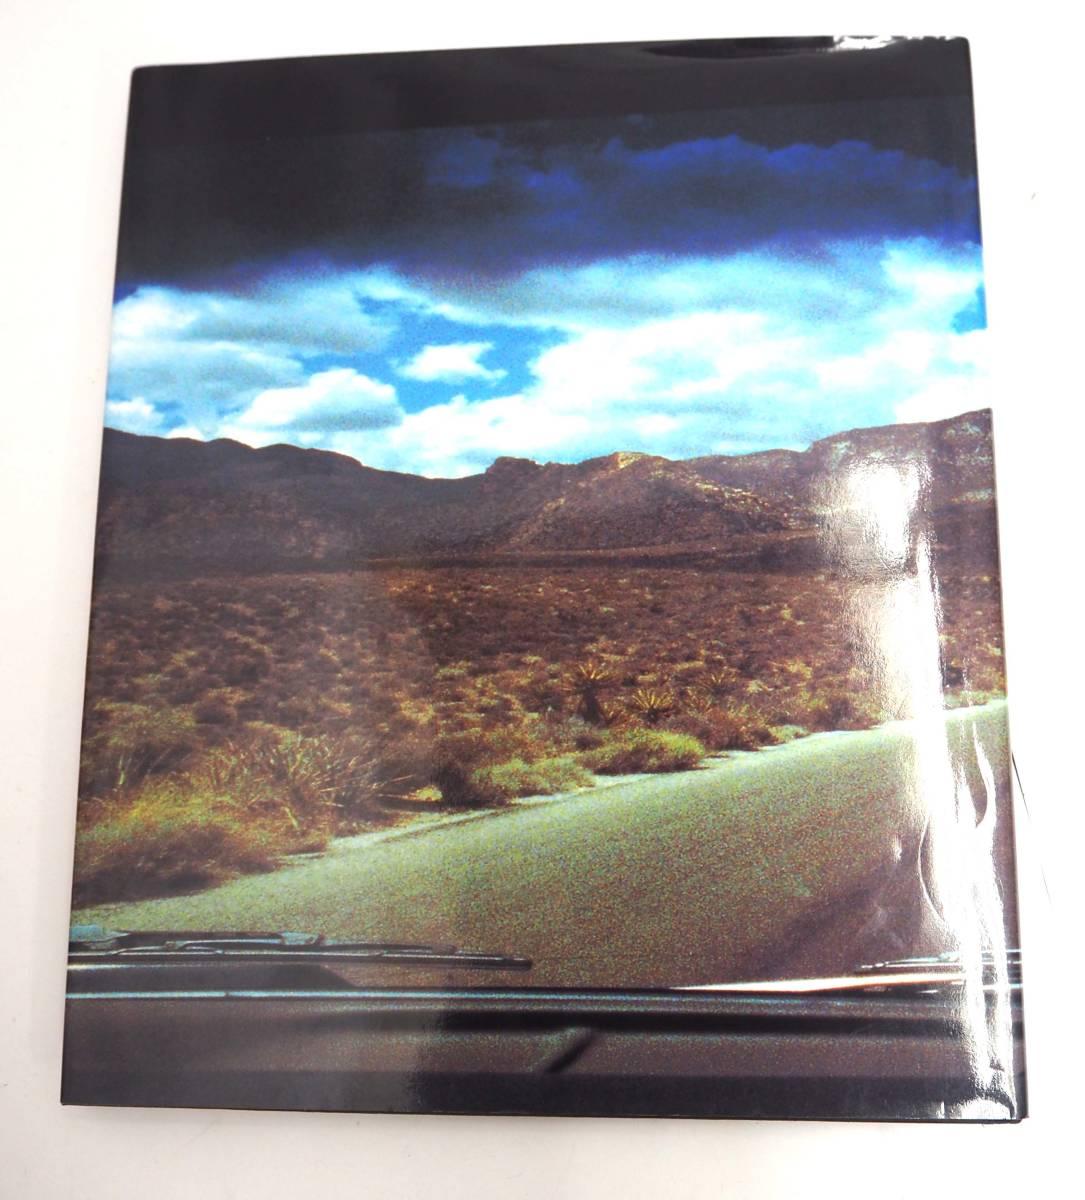 B'z LIVE GYM 2002 GREEN ツアー パンフレット_画像2